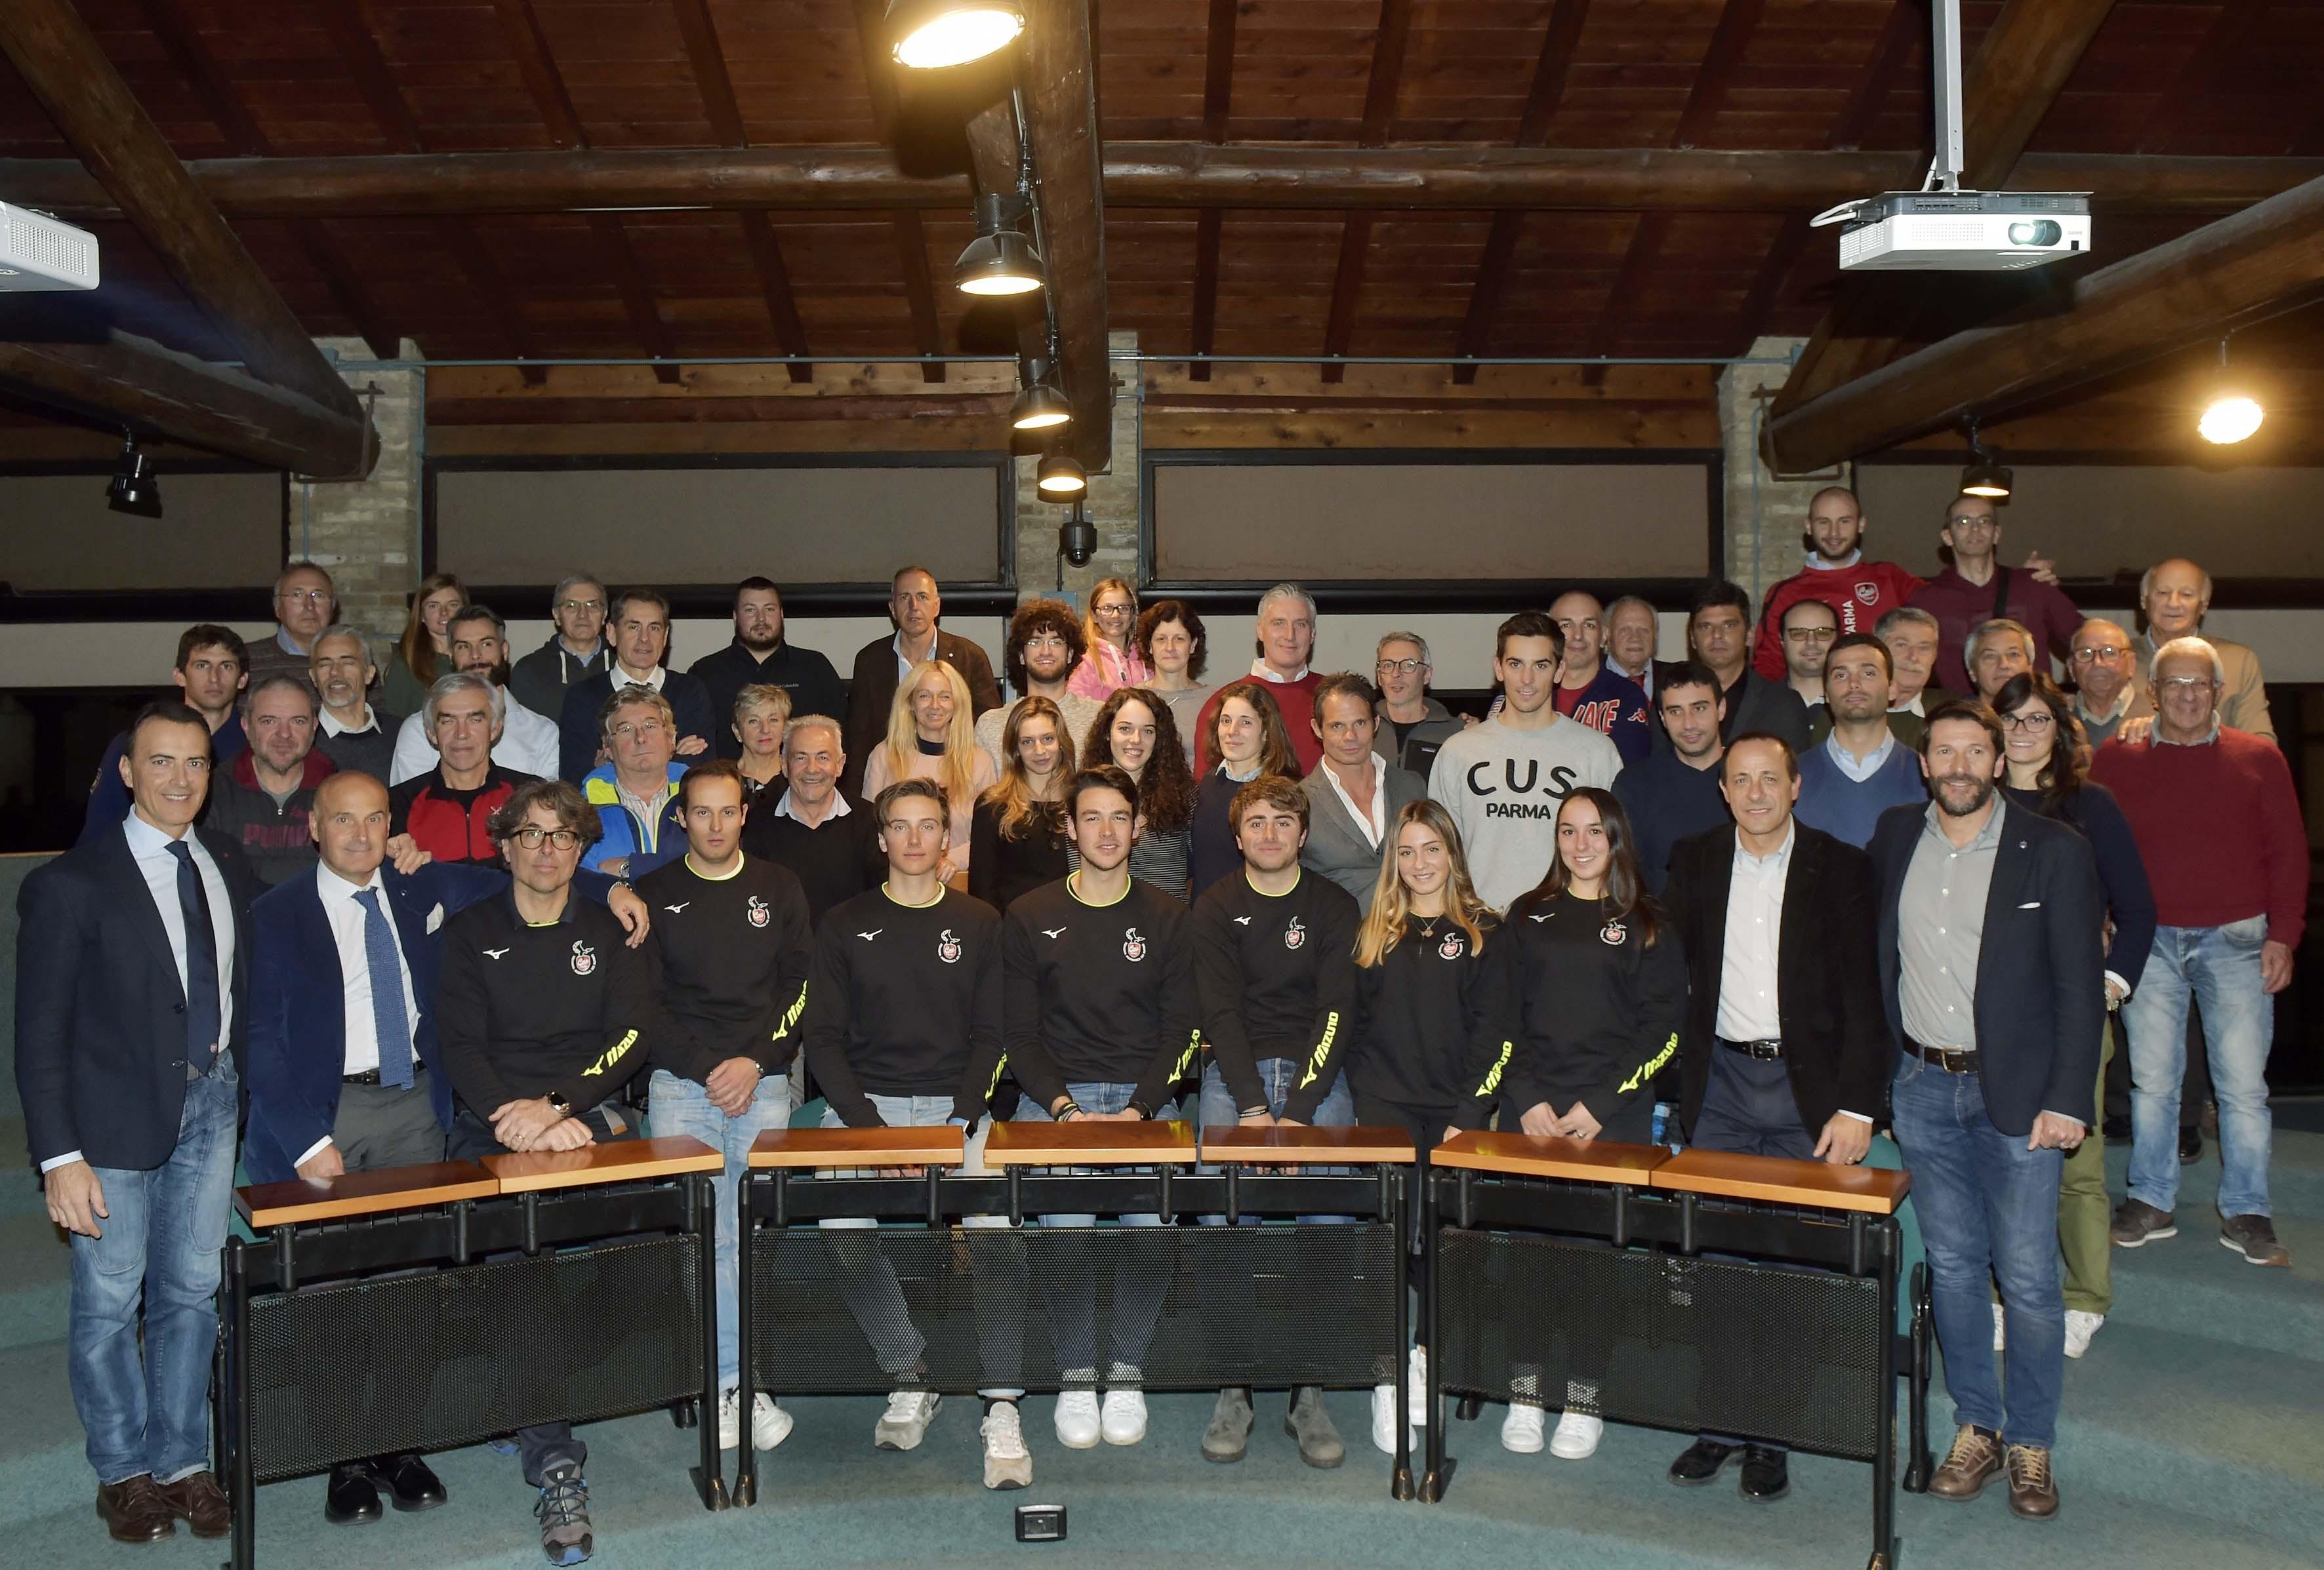 Calendario 2019 Agosto Más Arriba-a-fecha Sport Invernali – Cus Parma A S D